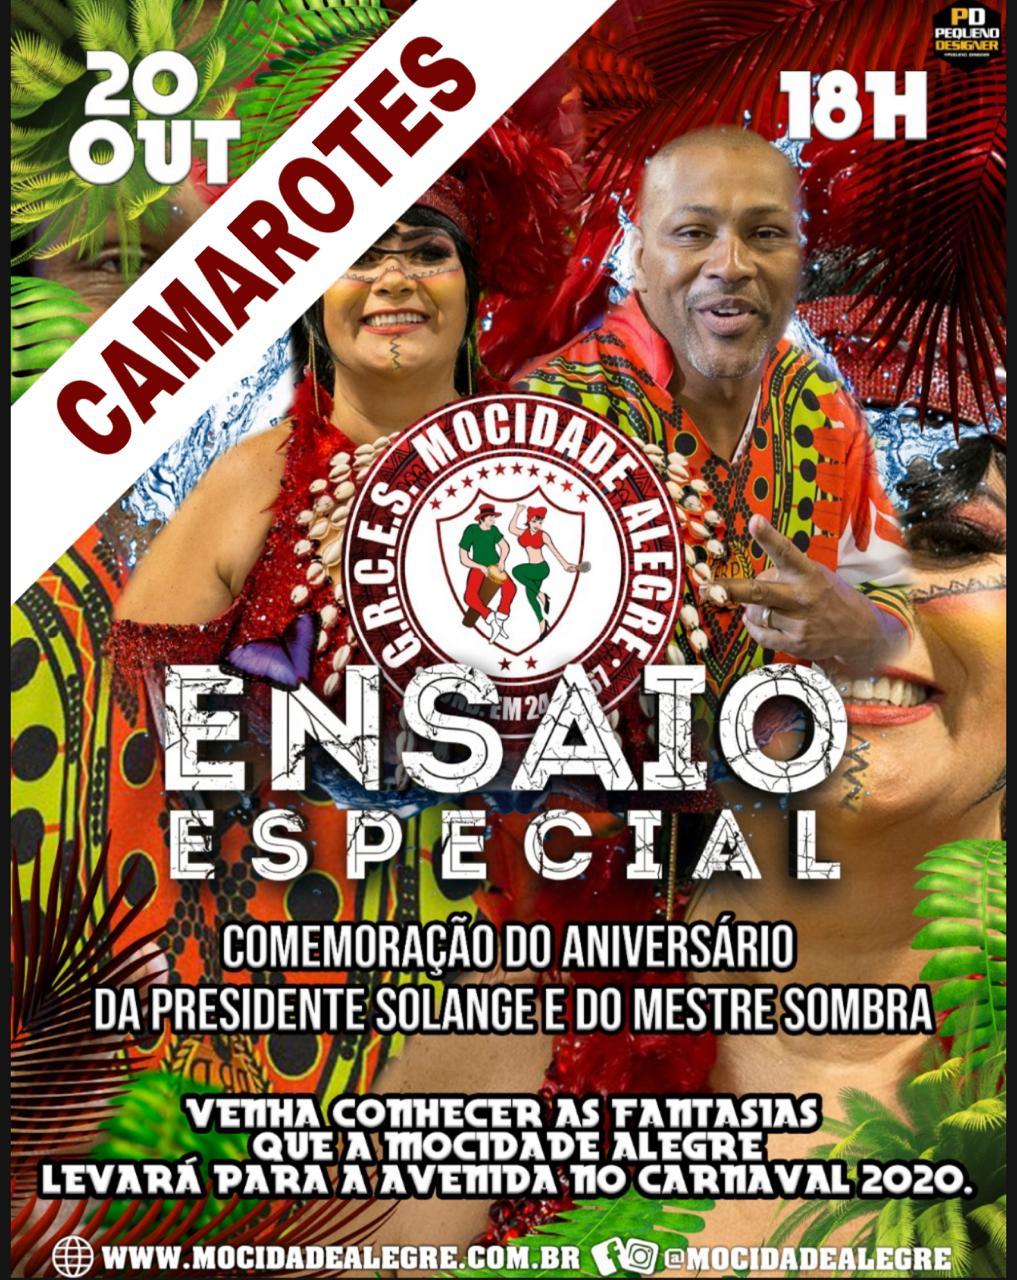 CAMAROTE - 20-10 - ENSAIO CARNAVAL 2020  - Mocidade Alegre